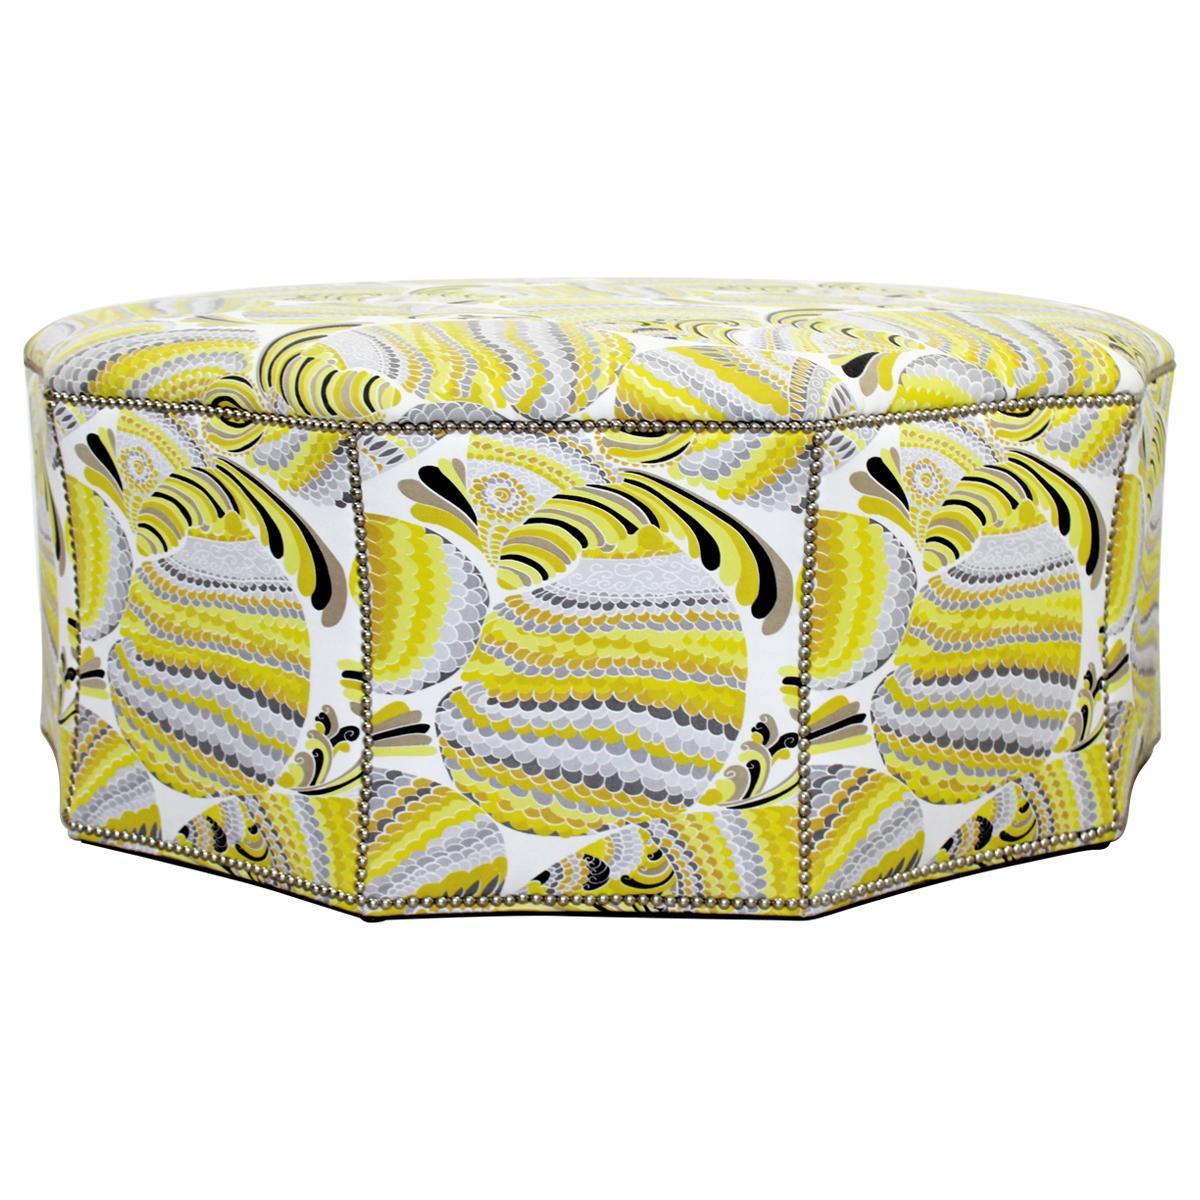 Contemporary Postmodern Swaim Studded Upholstered Large Ottoman Foot Stool Seat